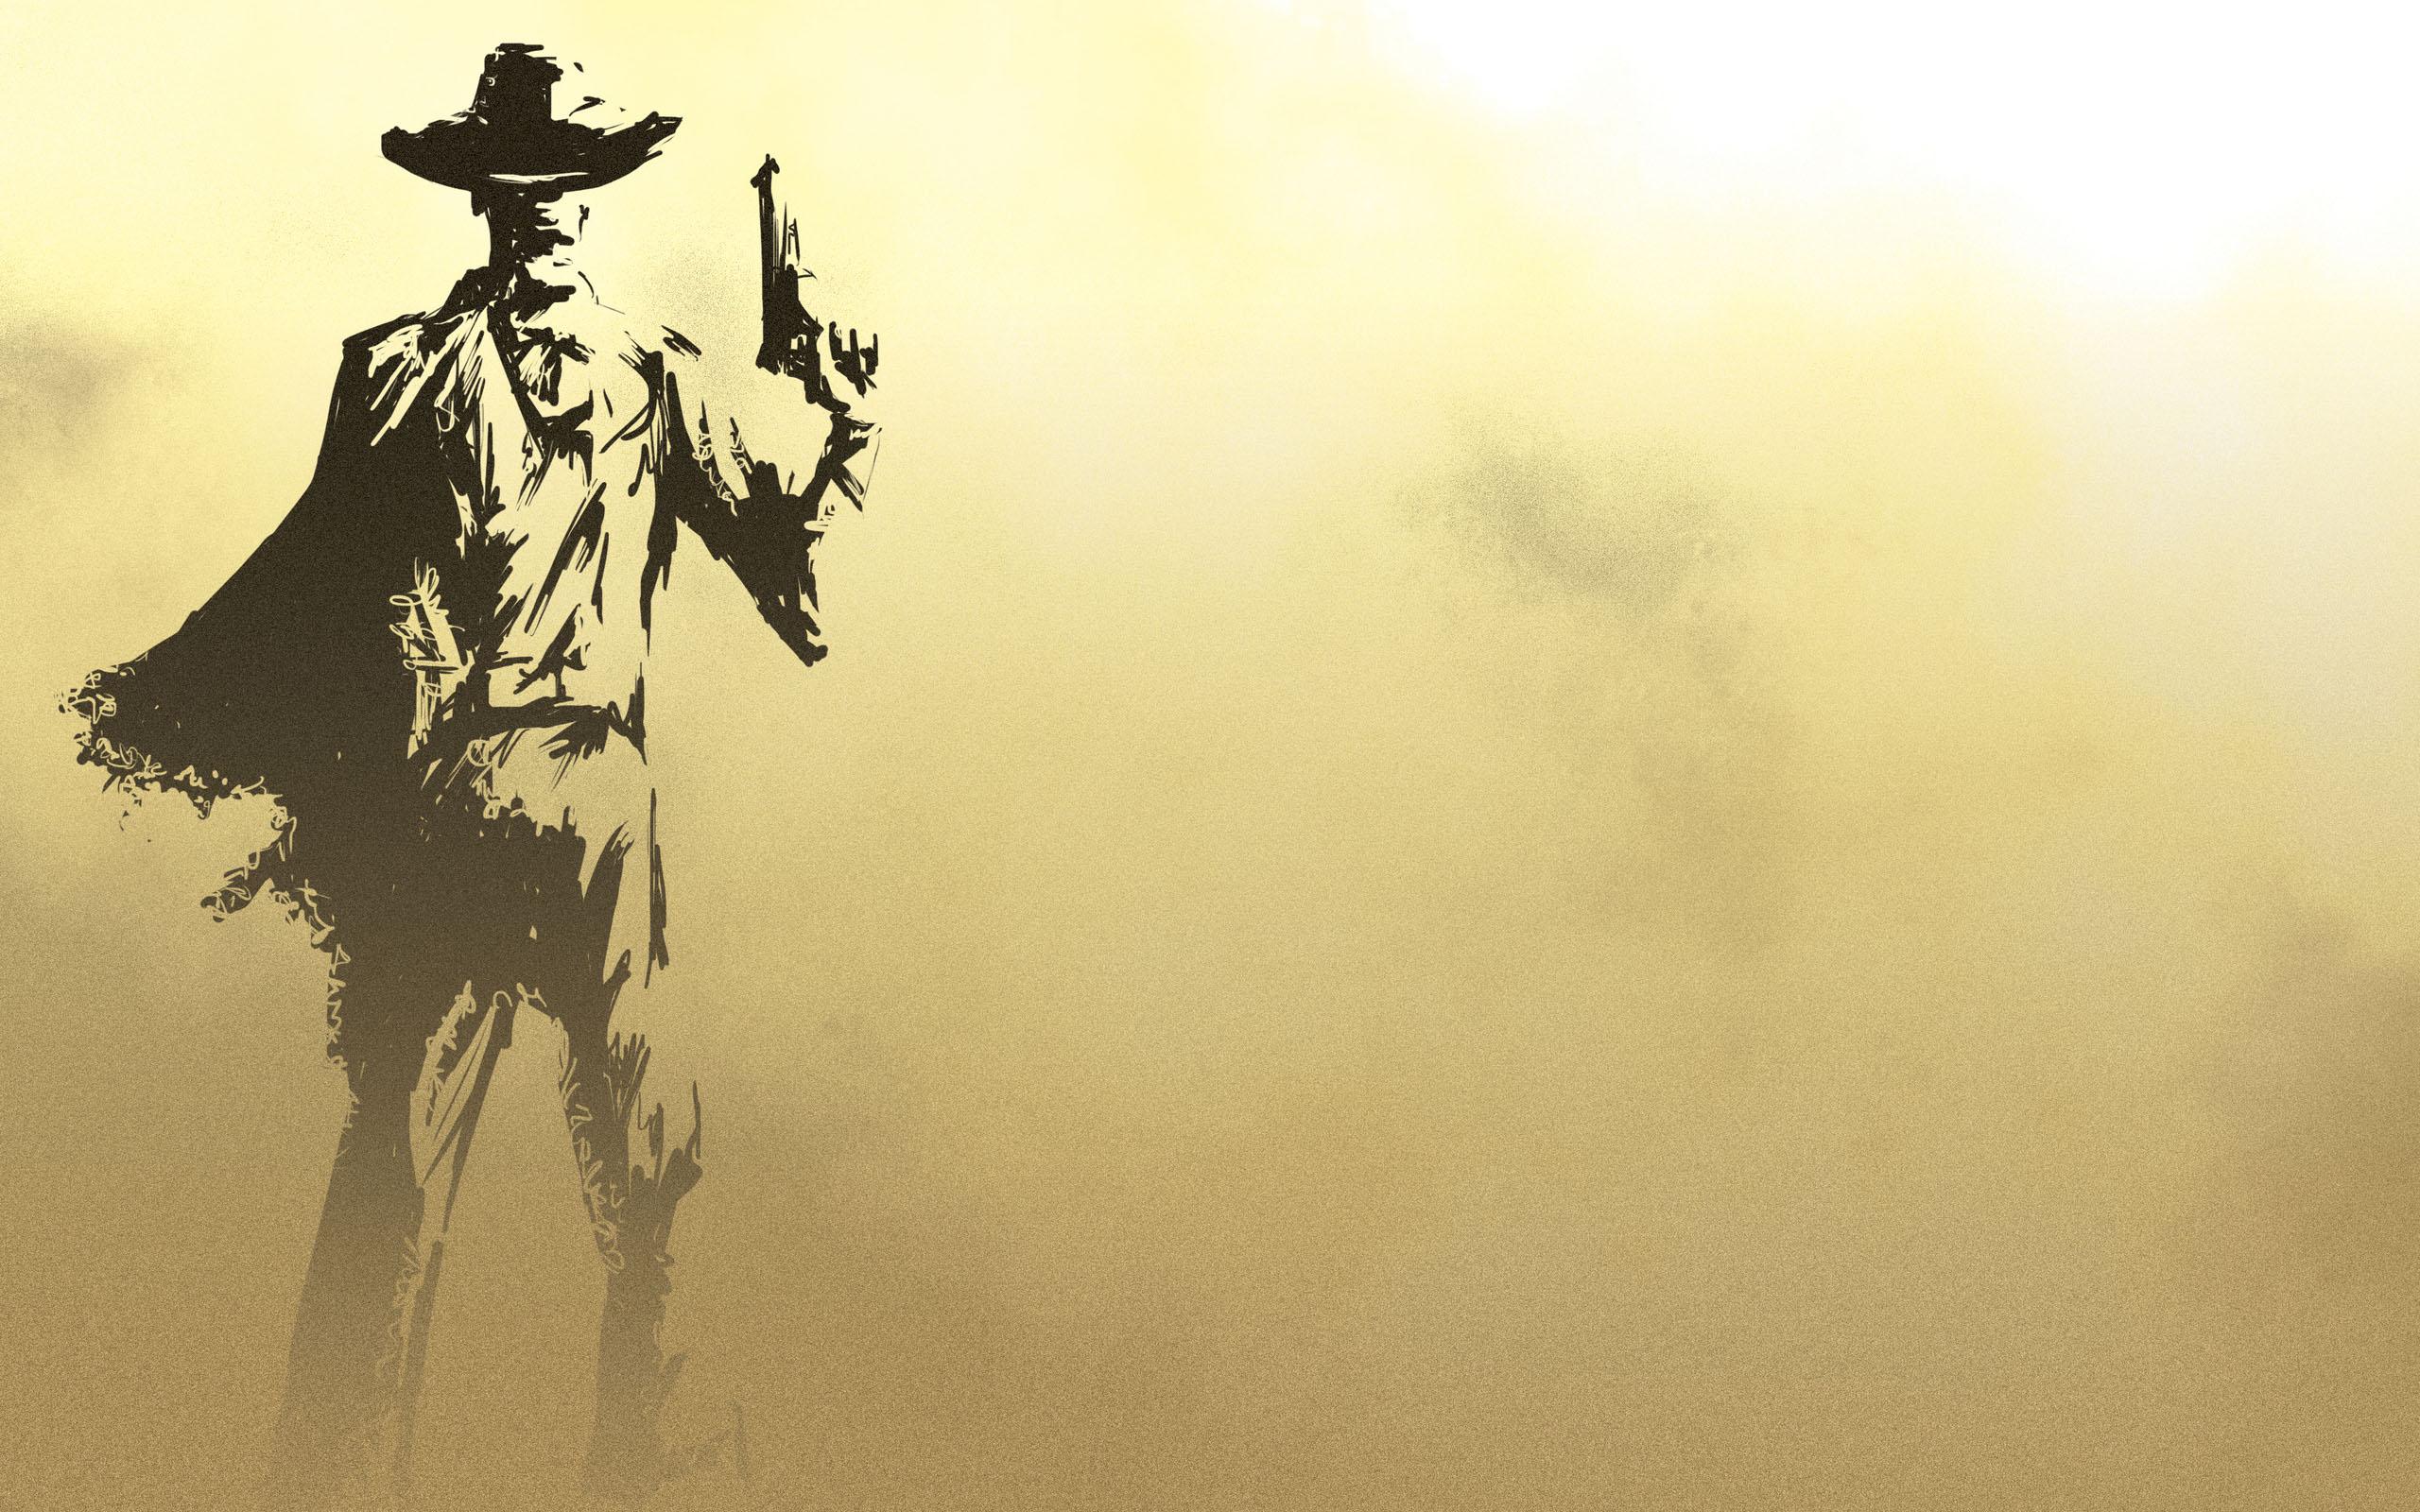 Cowboy Wallpaper   HD Wallpapers 2560x1600